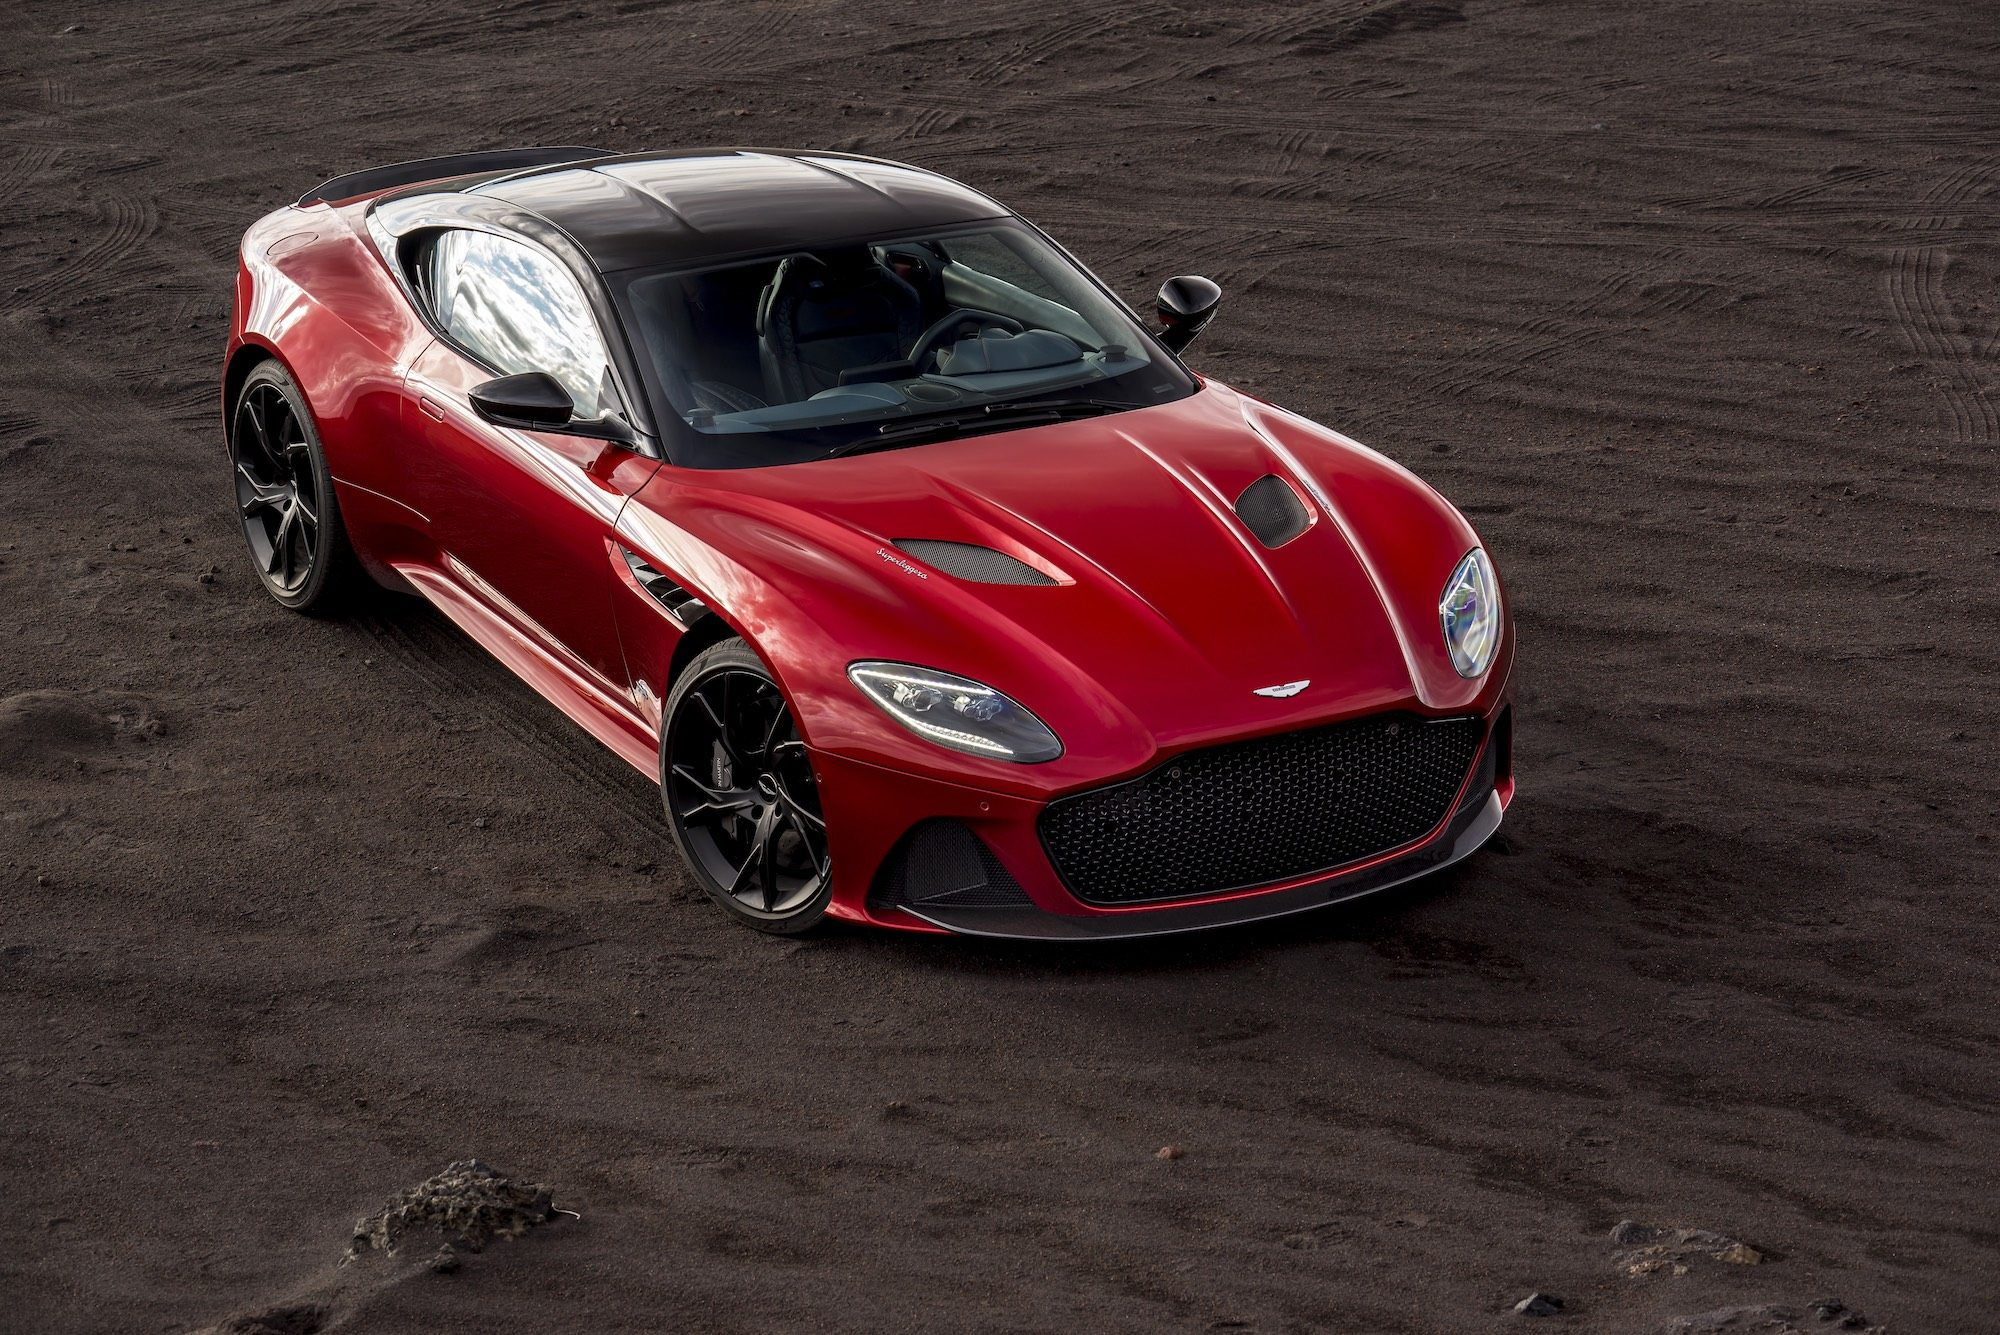 Aston Martins Lightweight Legend Drops Another Pounds SURFACE - Aston martin latest models